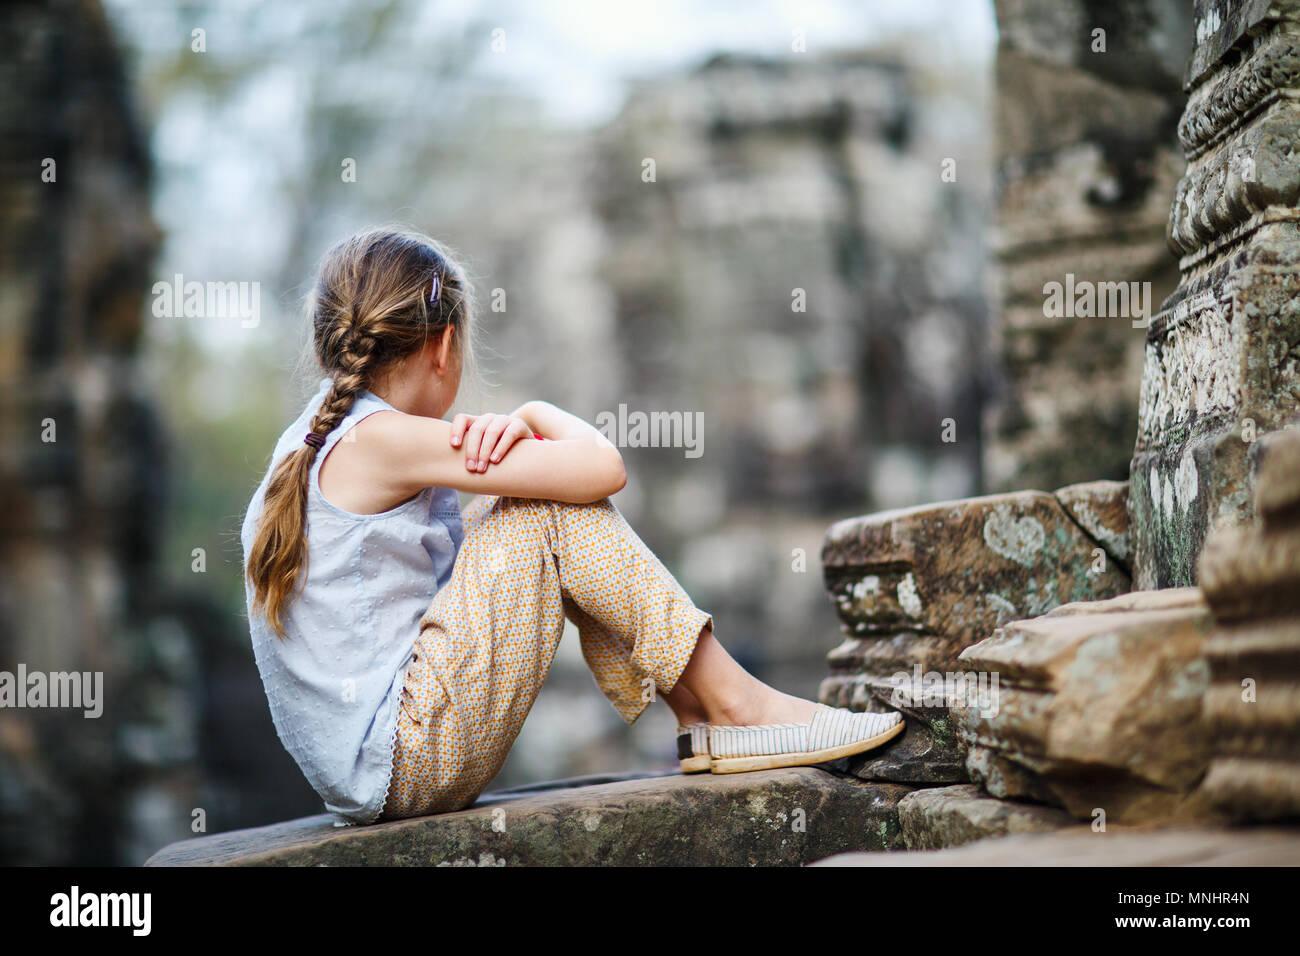 Bambina all antica Preah Khan tempio di Angkor area archeologica in Cambogia Immagini Stock